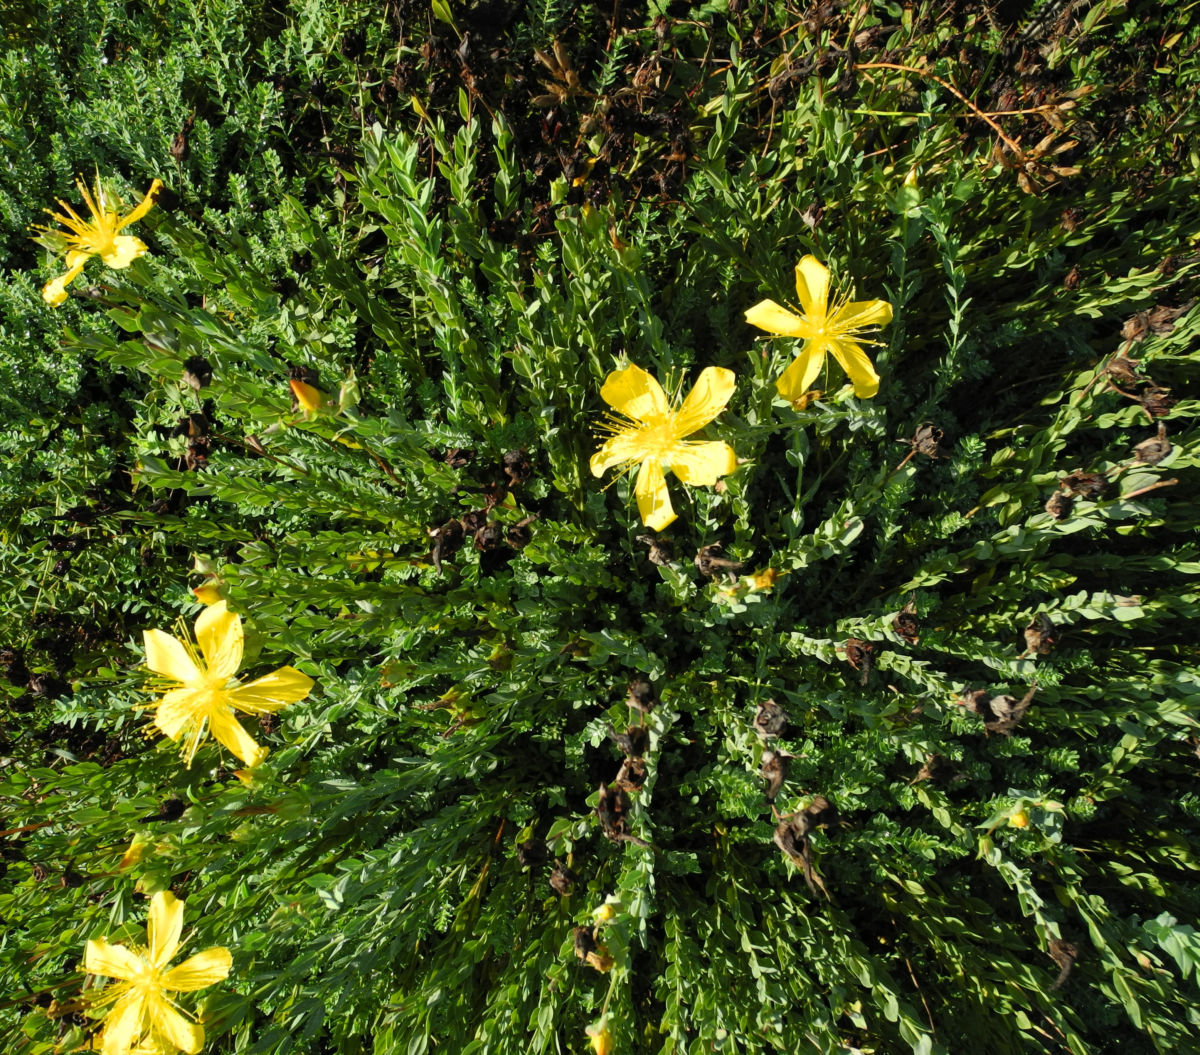 Vielblaettriges Johanniskraut staude Hypericum polyphyllum